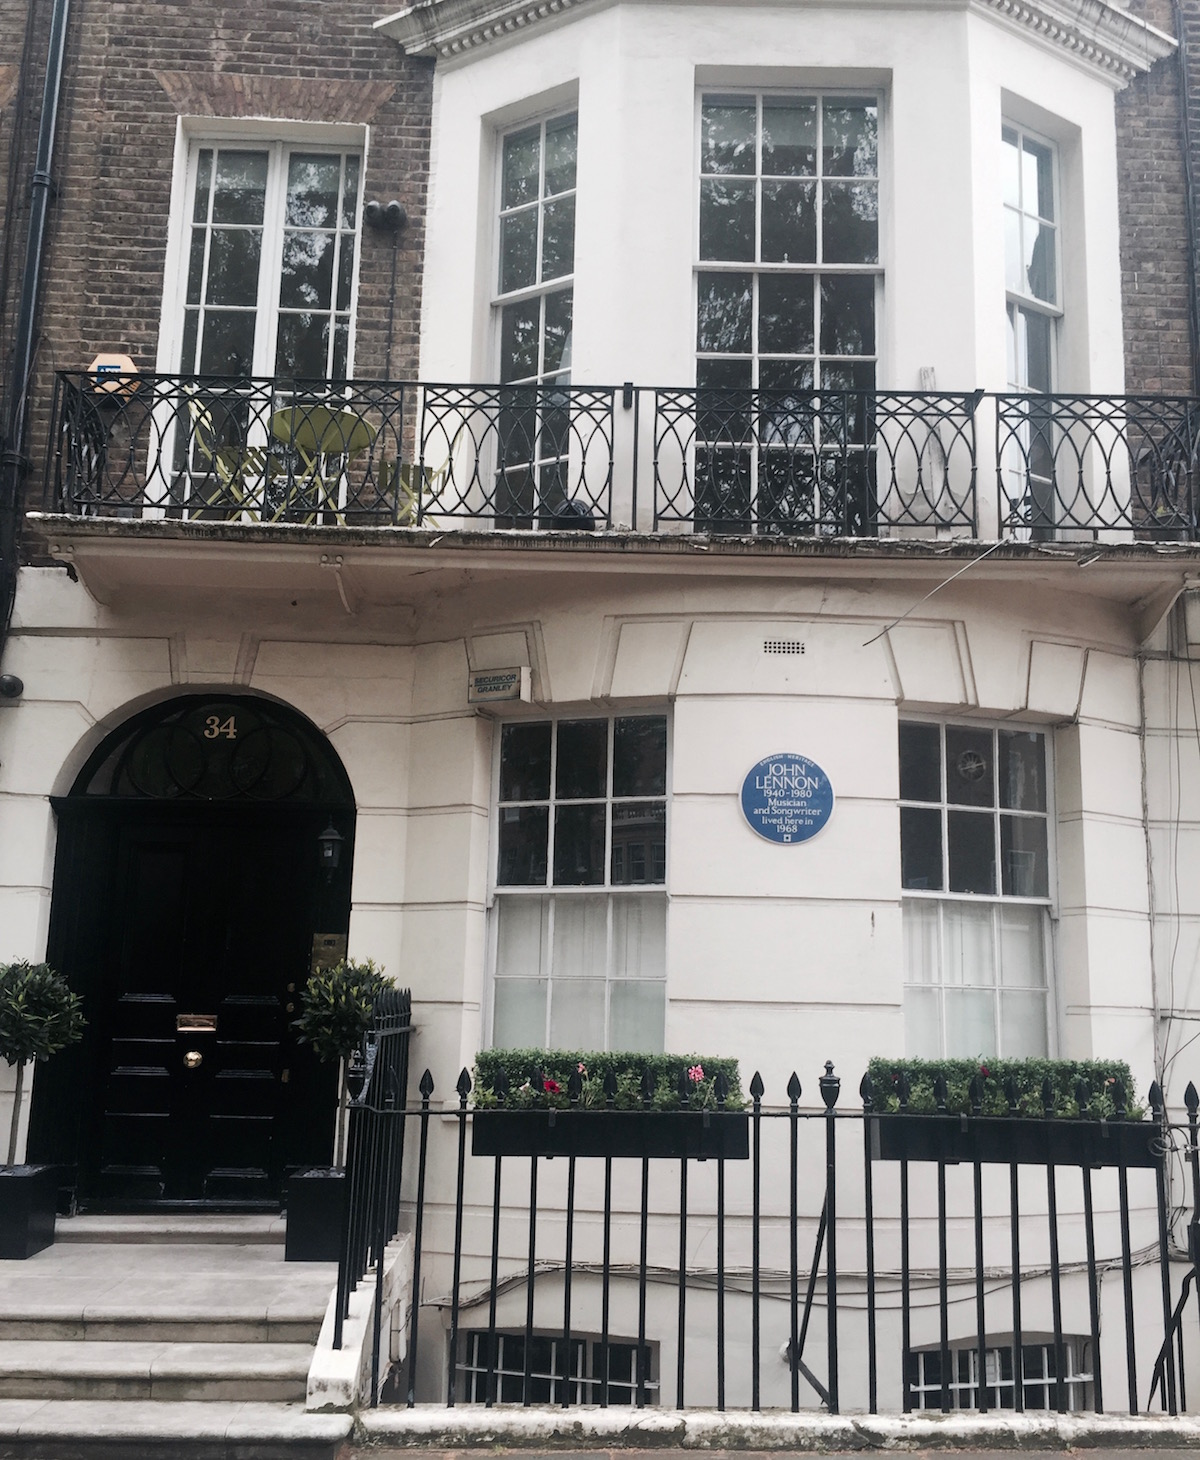 John Lennon's house in Marylebone, London